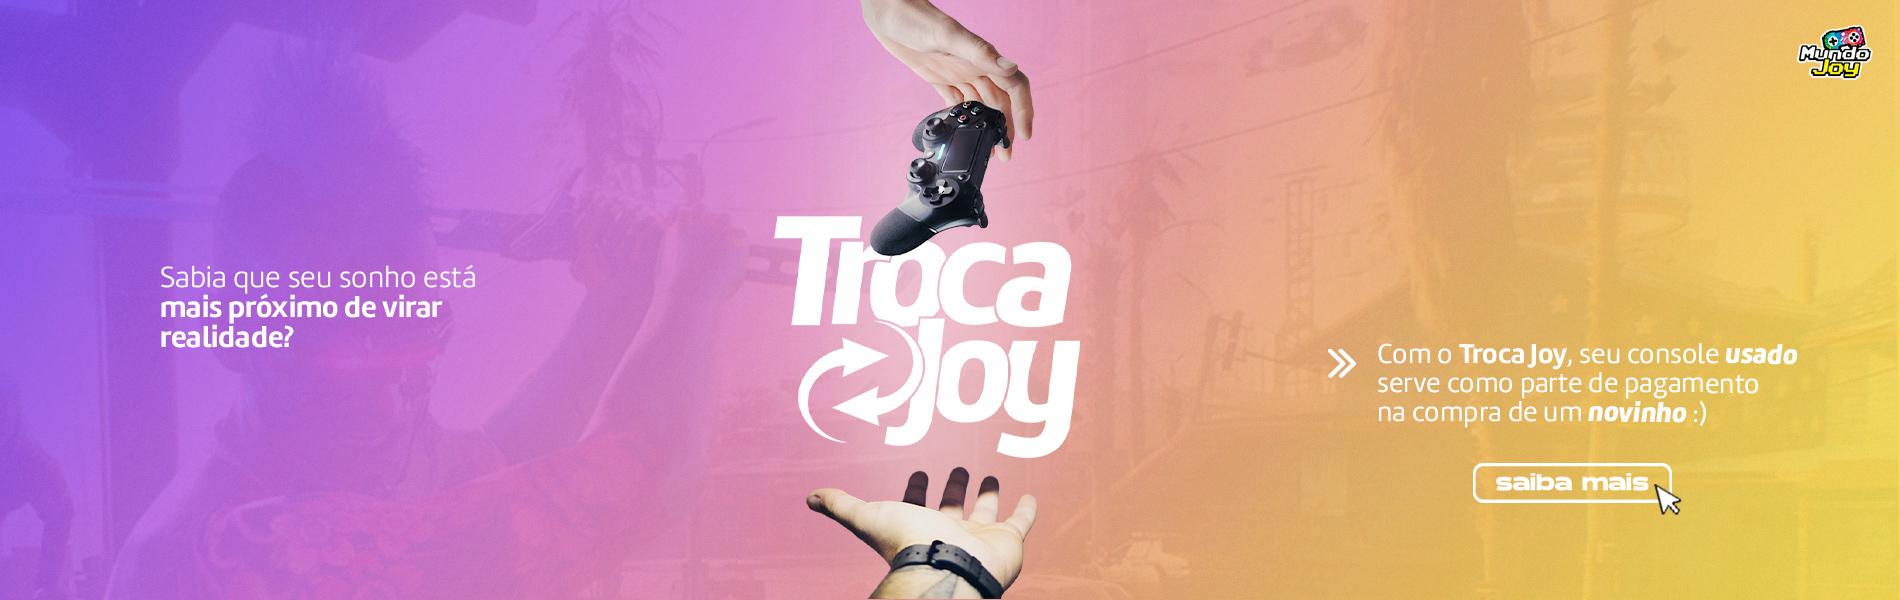 Troca Joy